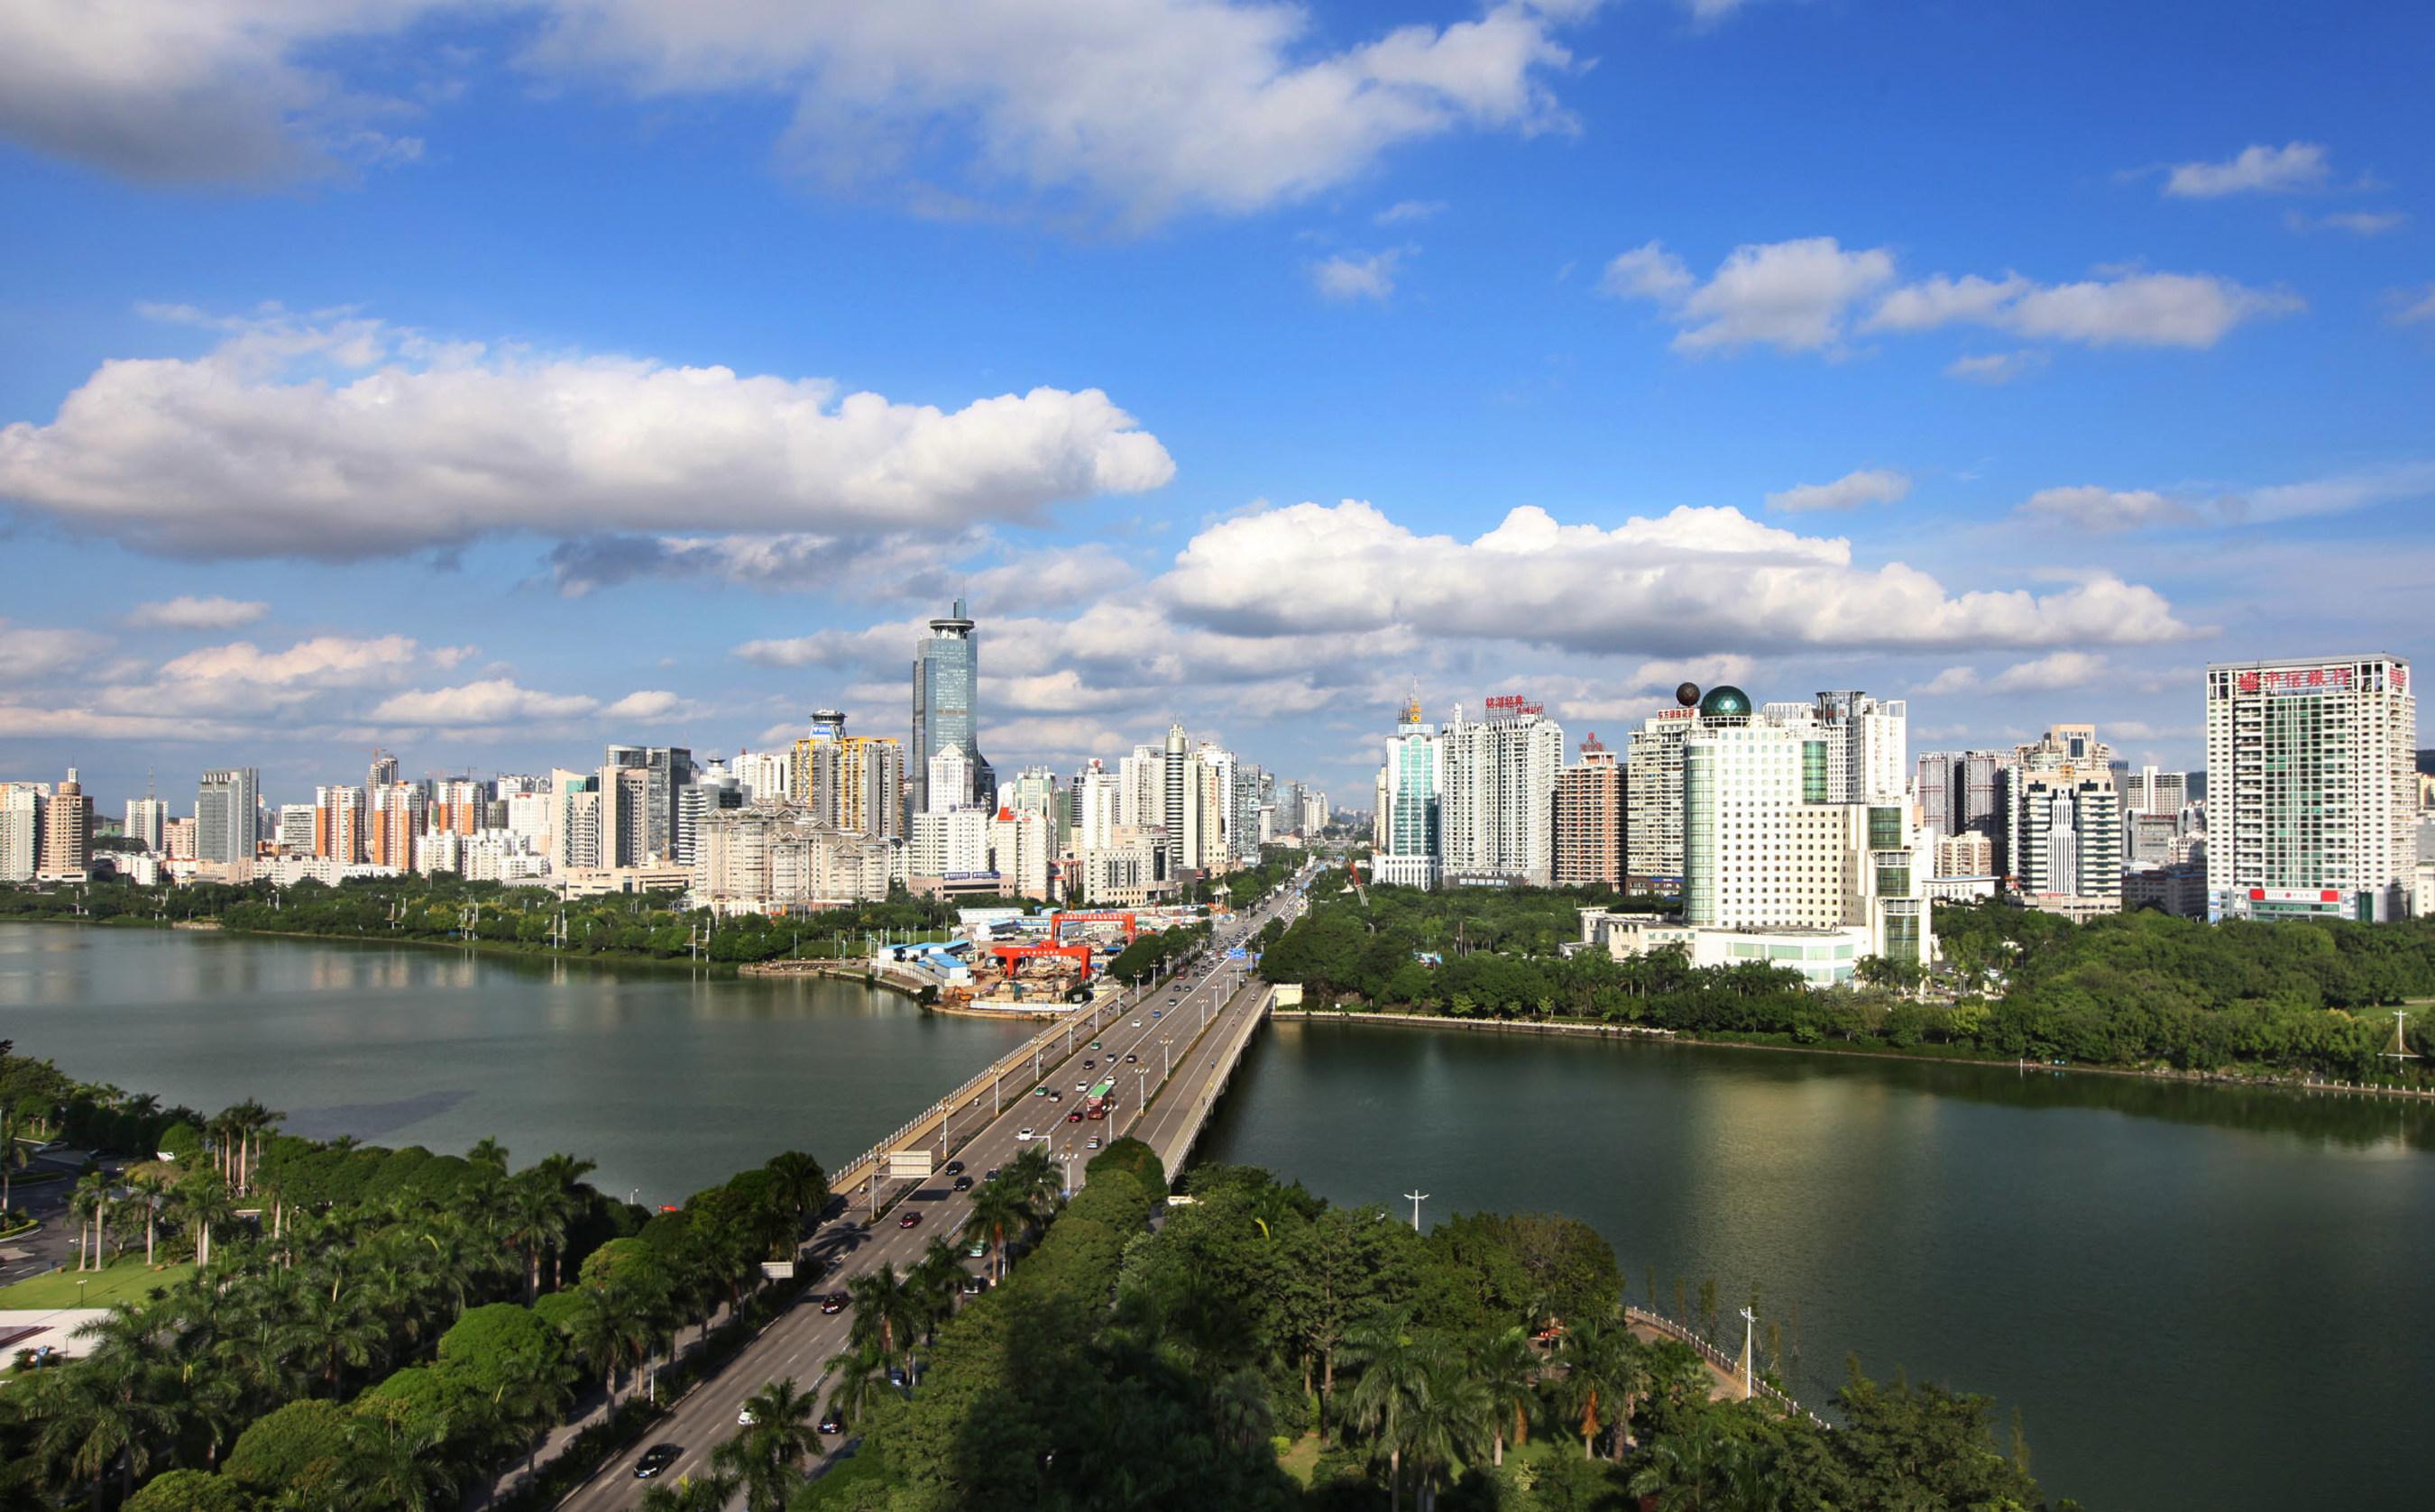 Nanning City und Xinhua News Agency geben China-ASEAN Monetary Index heraus